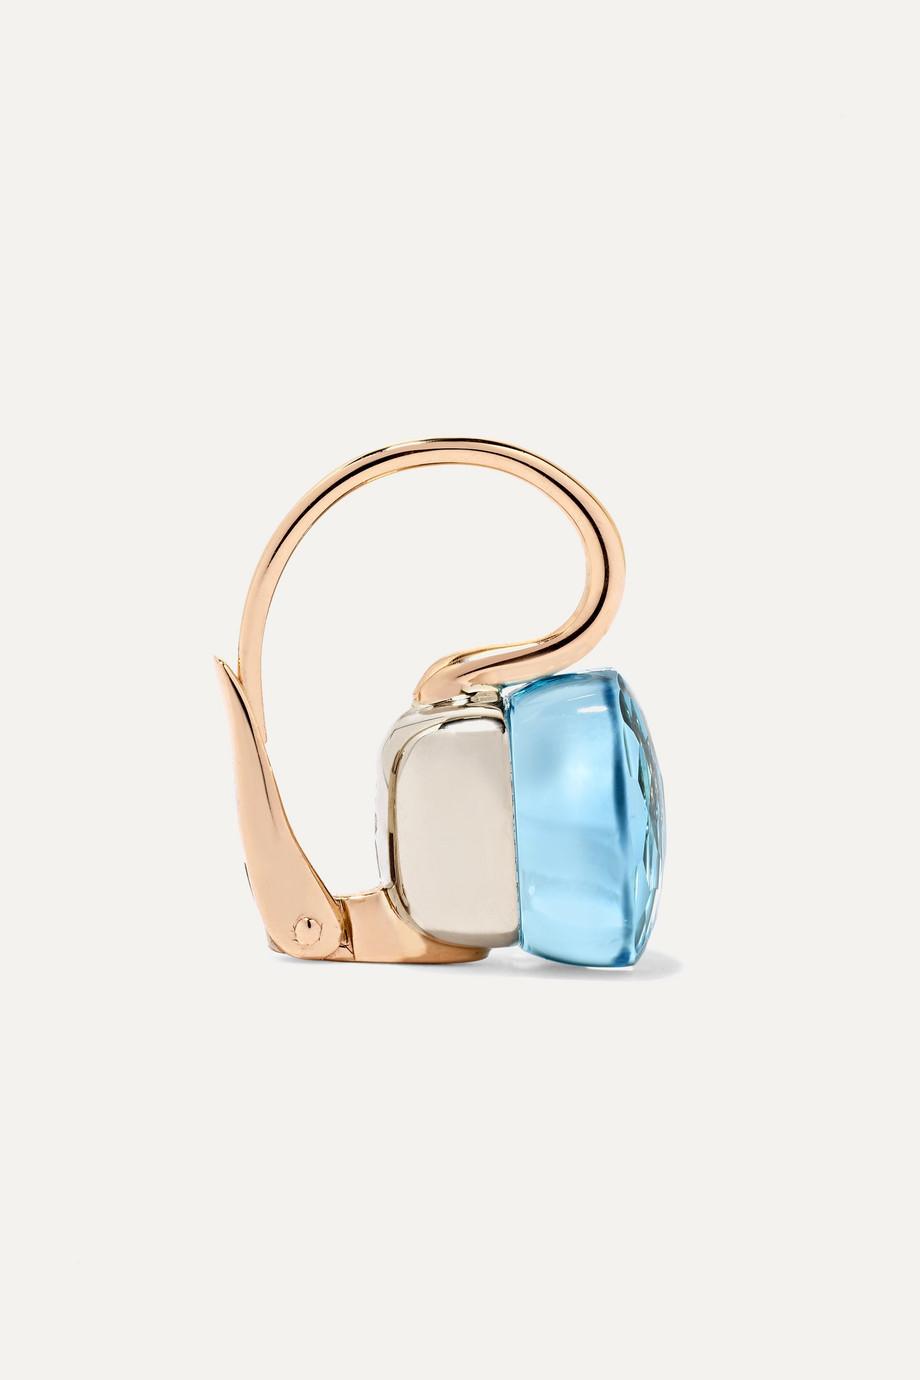 Pomellato Nudo 18-karat rose gold topaz earrings